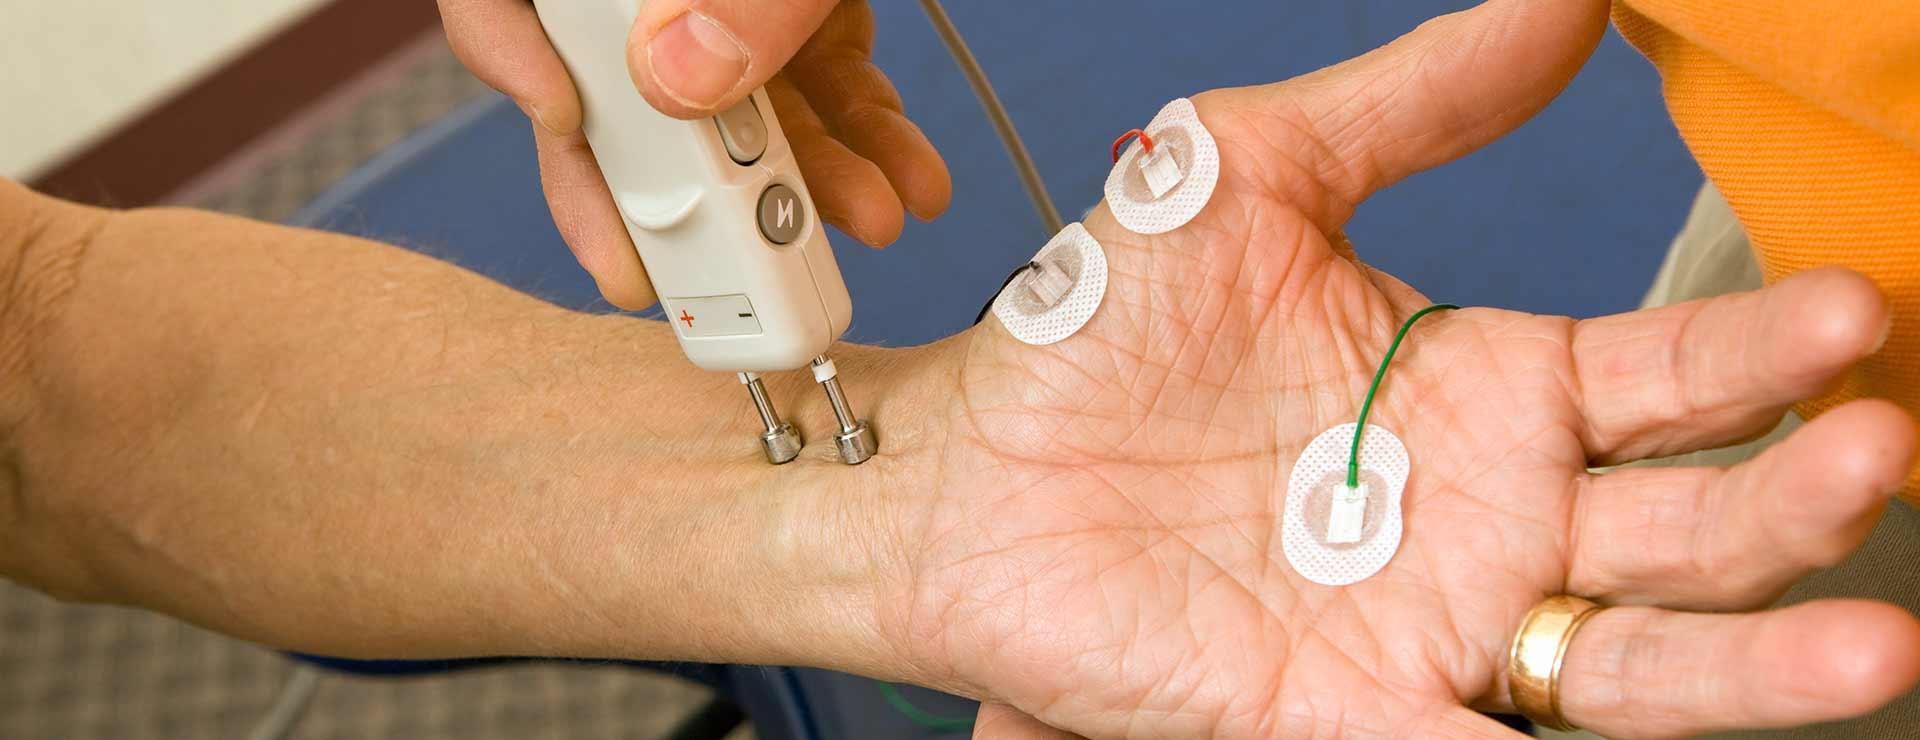 Nerve Conduction Studies | Johns Hopkins Medicine